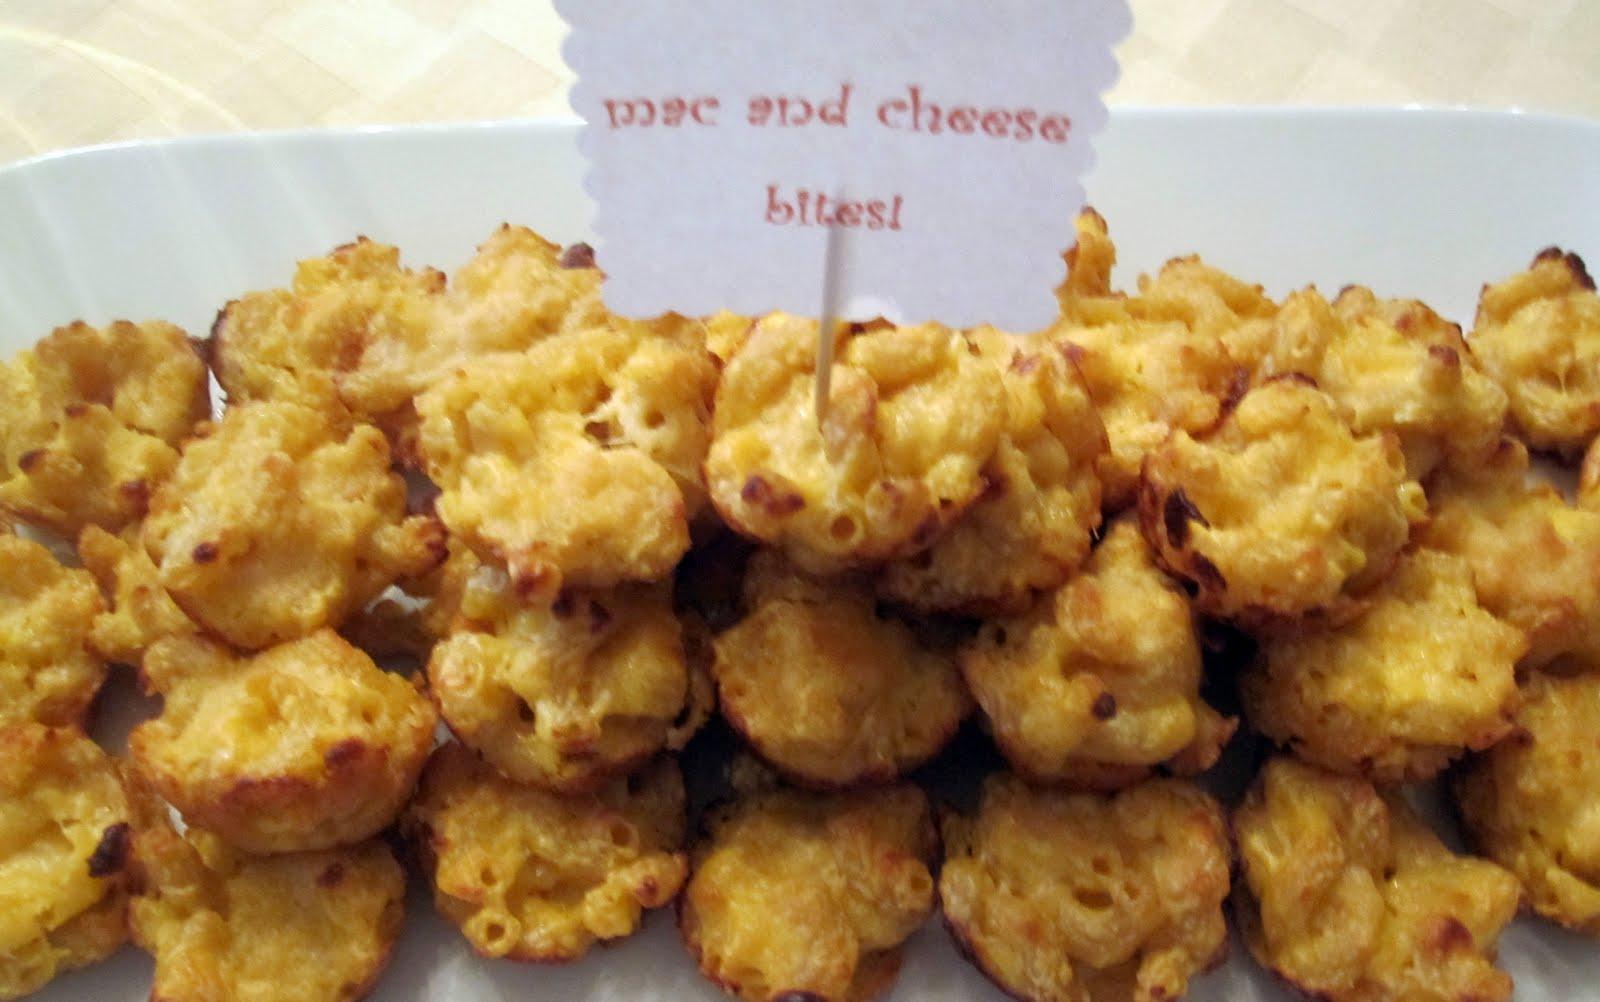 mini mac and cheese bites